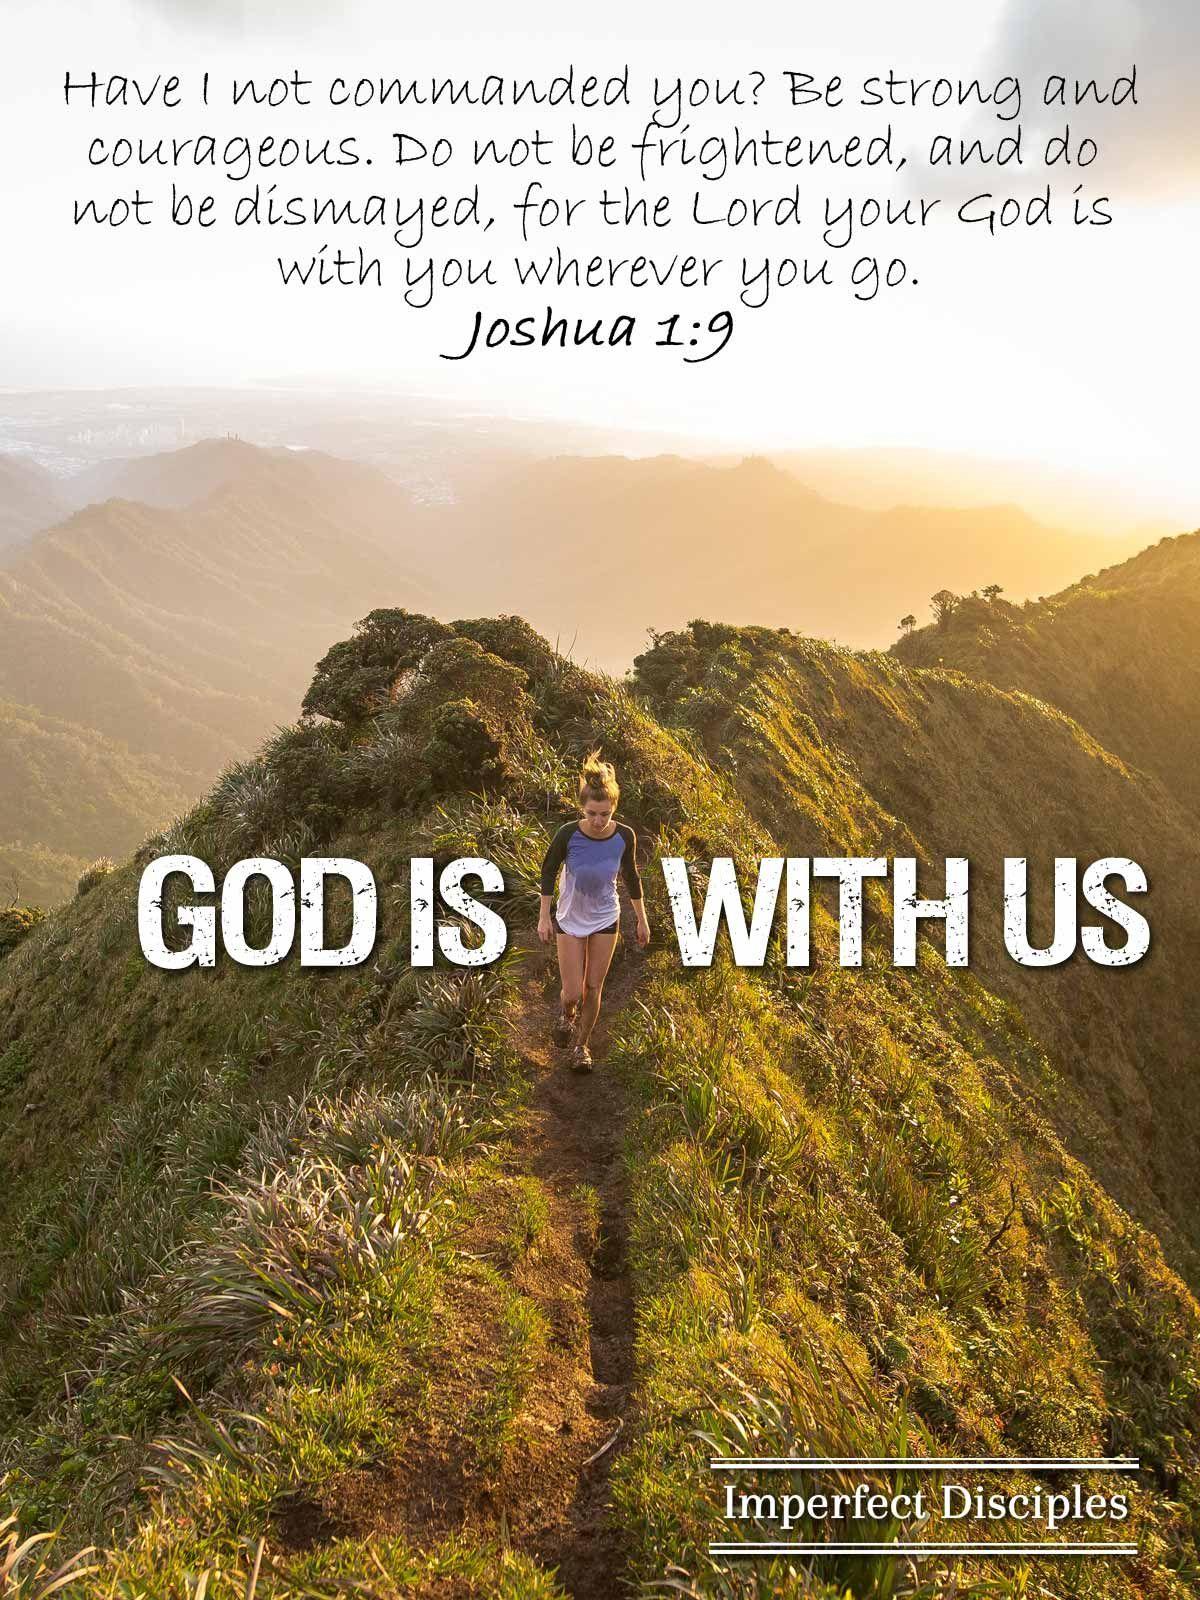 god is us joshua scripture memory song scripture